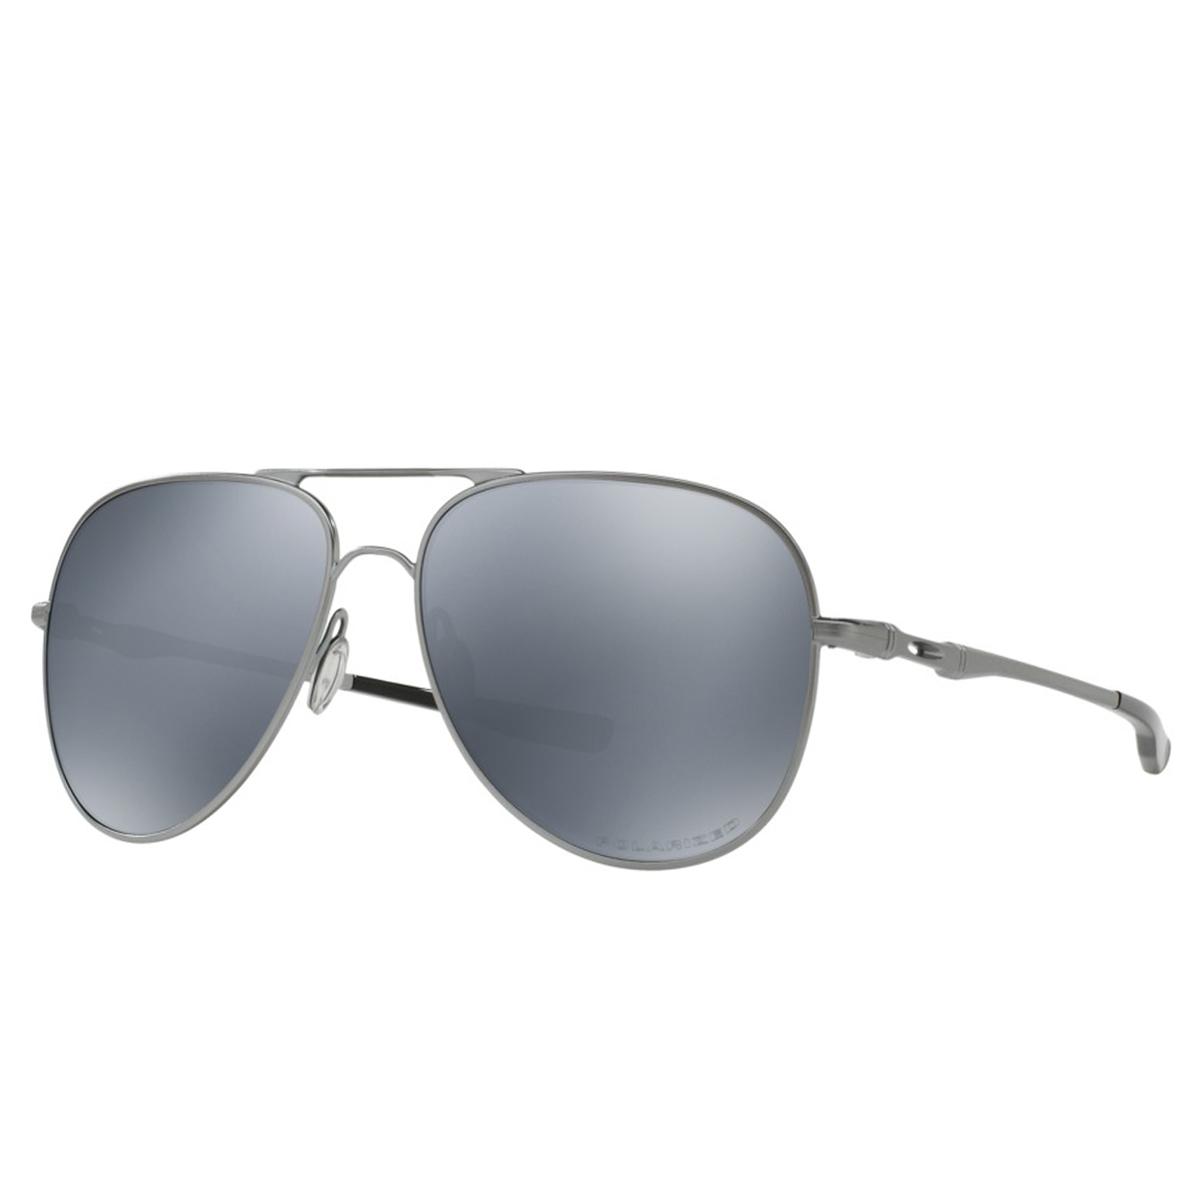 9b0b8142e5fee Óculos de Sol Oakley Elmont 60 Dourado - Compre Agora   Dafiti Brasil  Óculos Oakley Elmont L Lead  Lente Black Iridium Polarizado ref OO4119-06